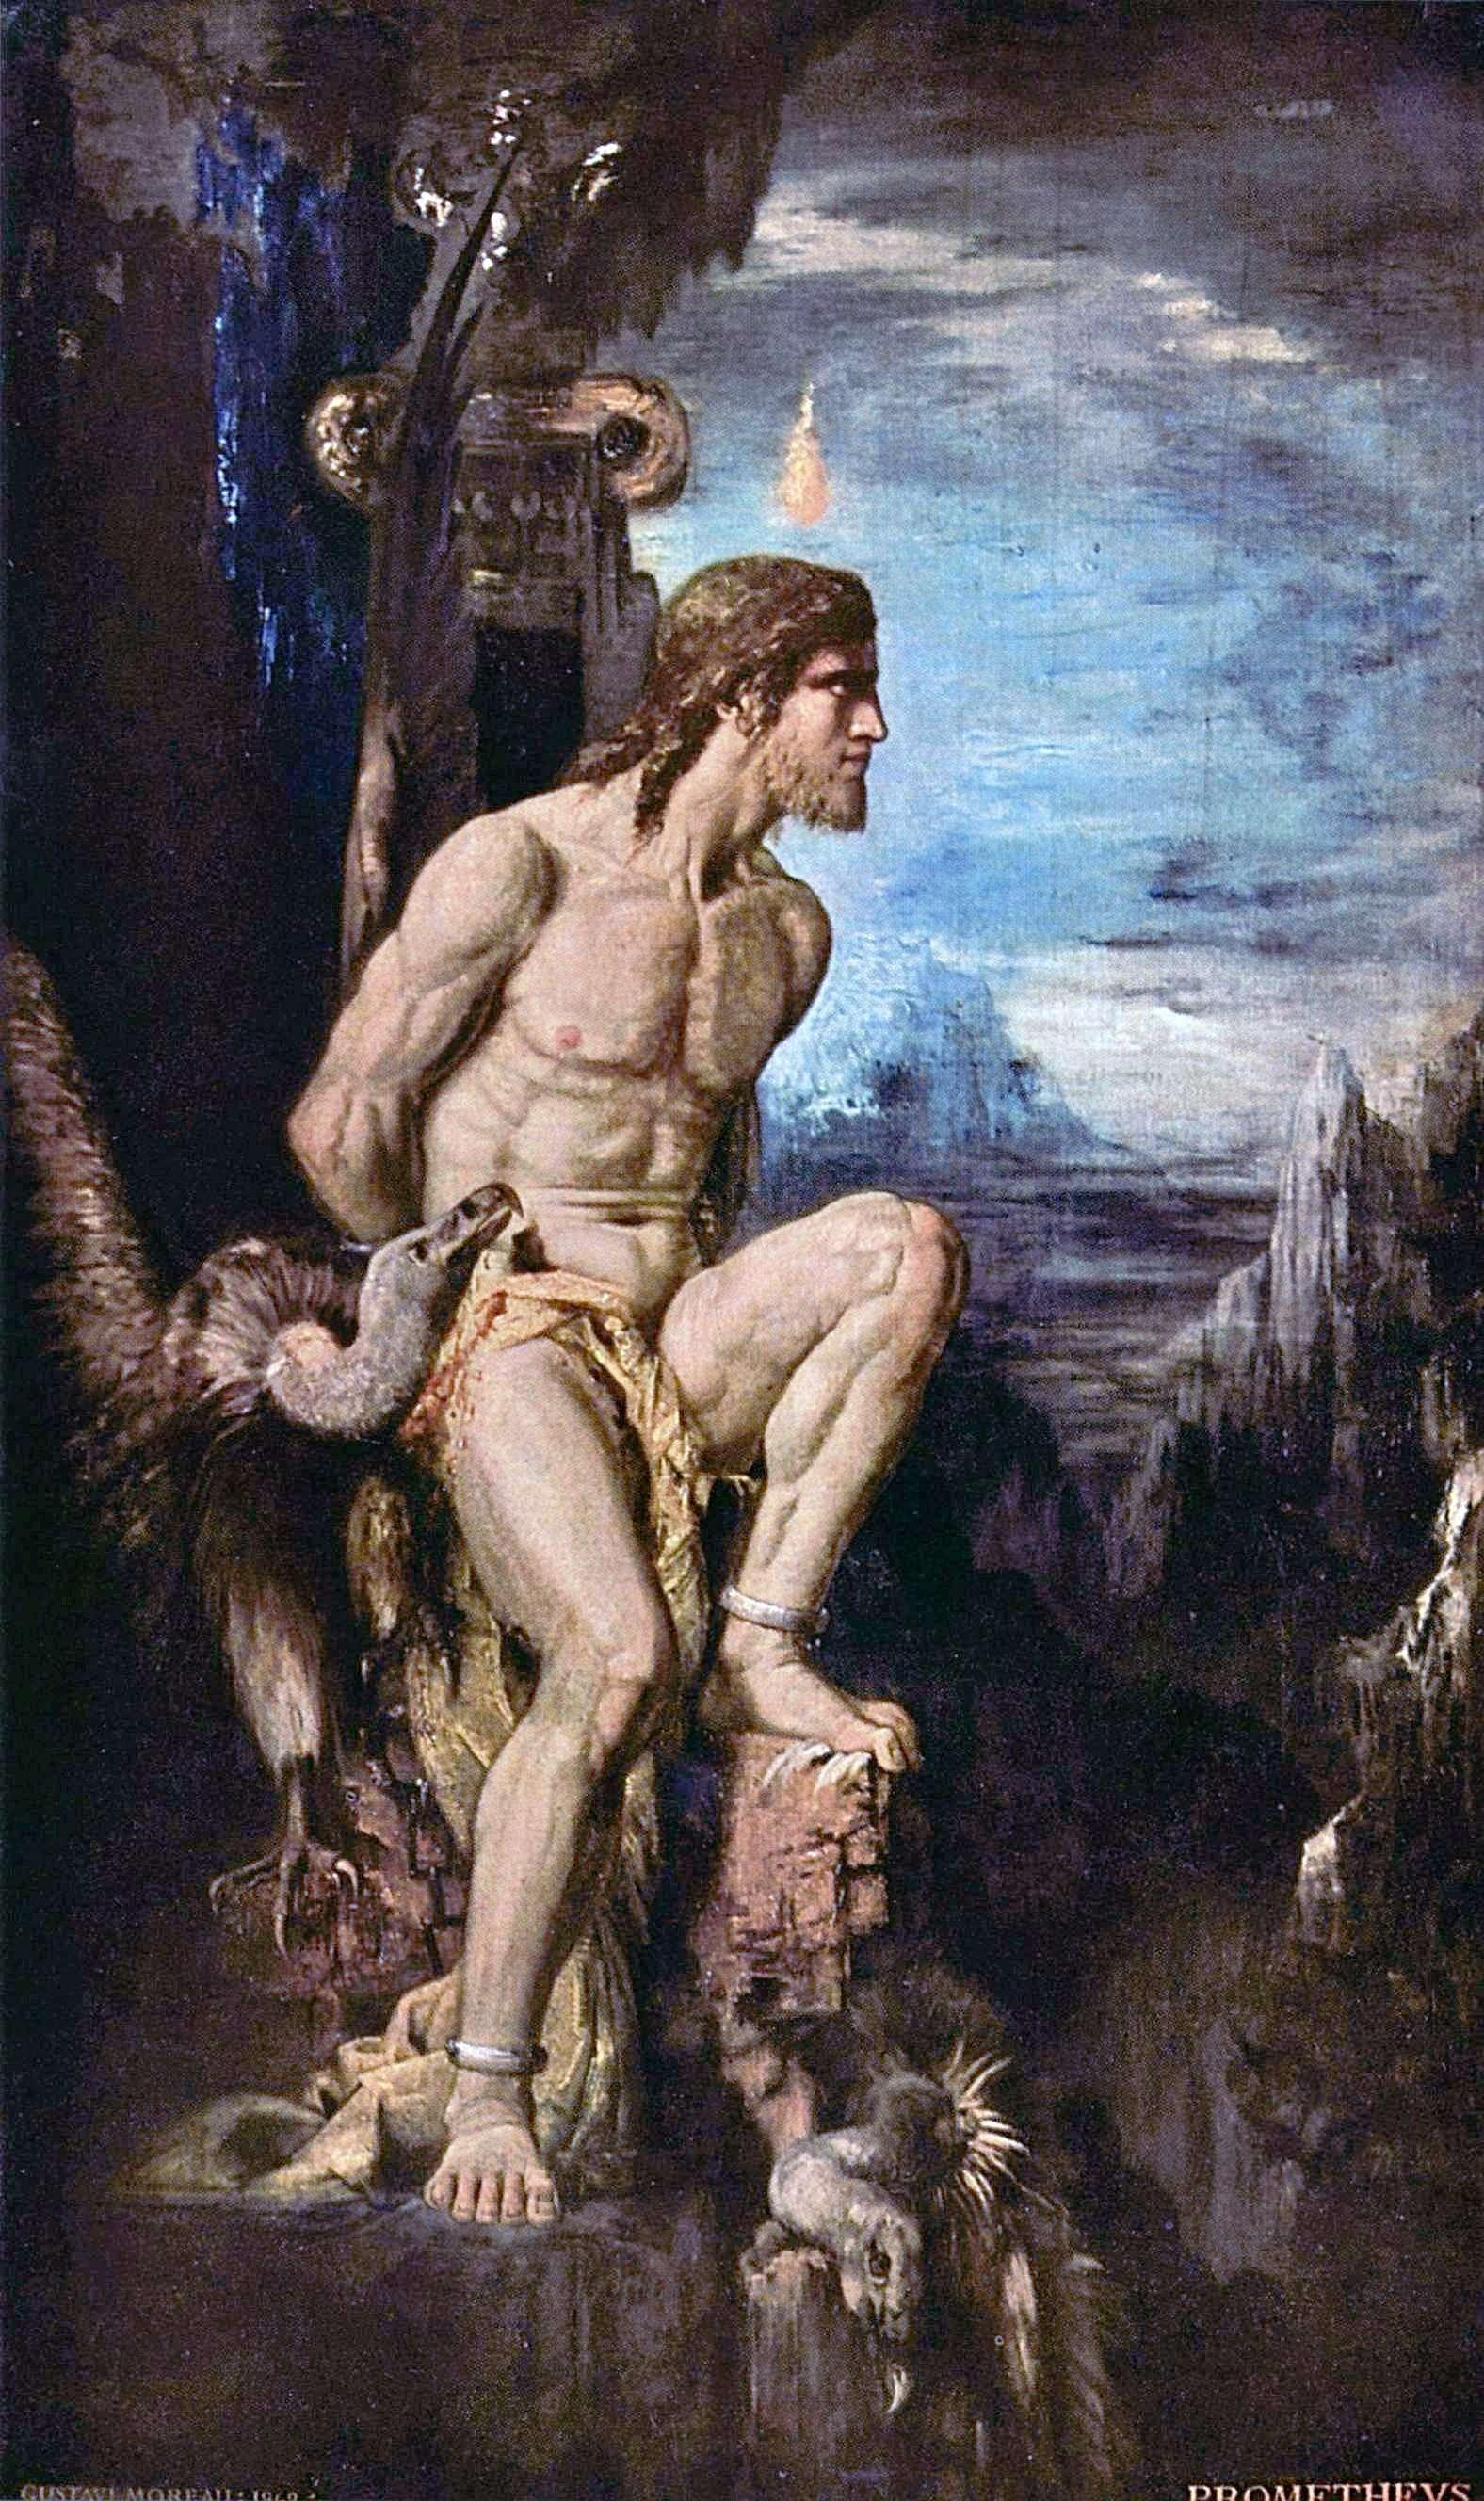 Prometheus (1868), by Gustave Moreau